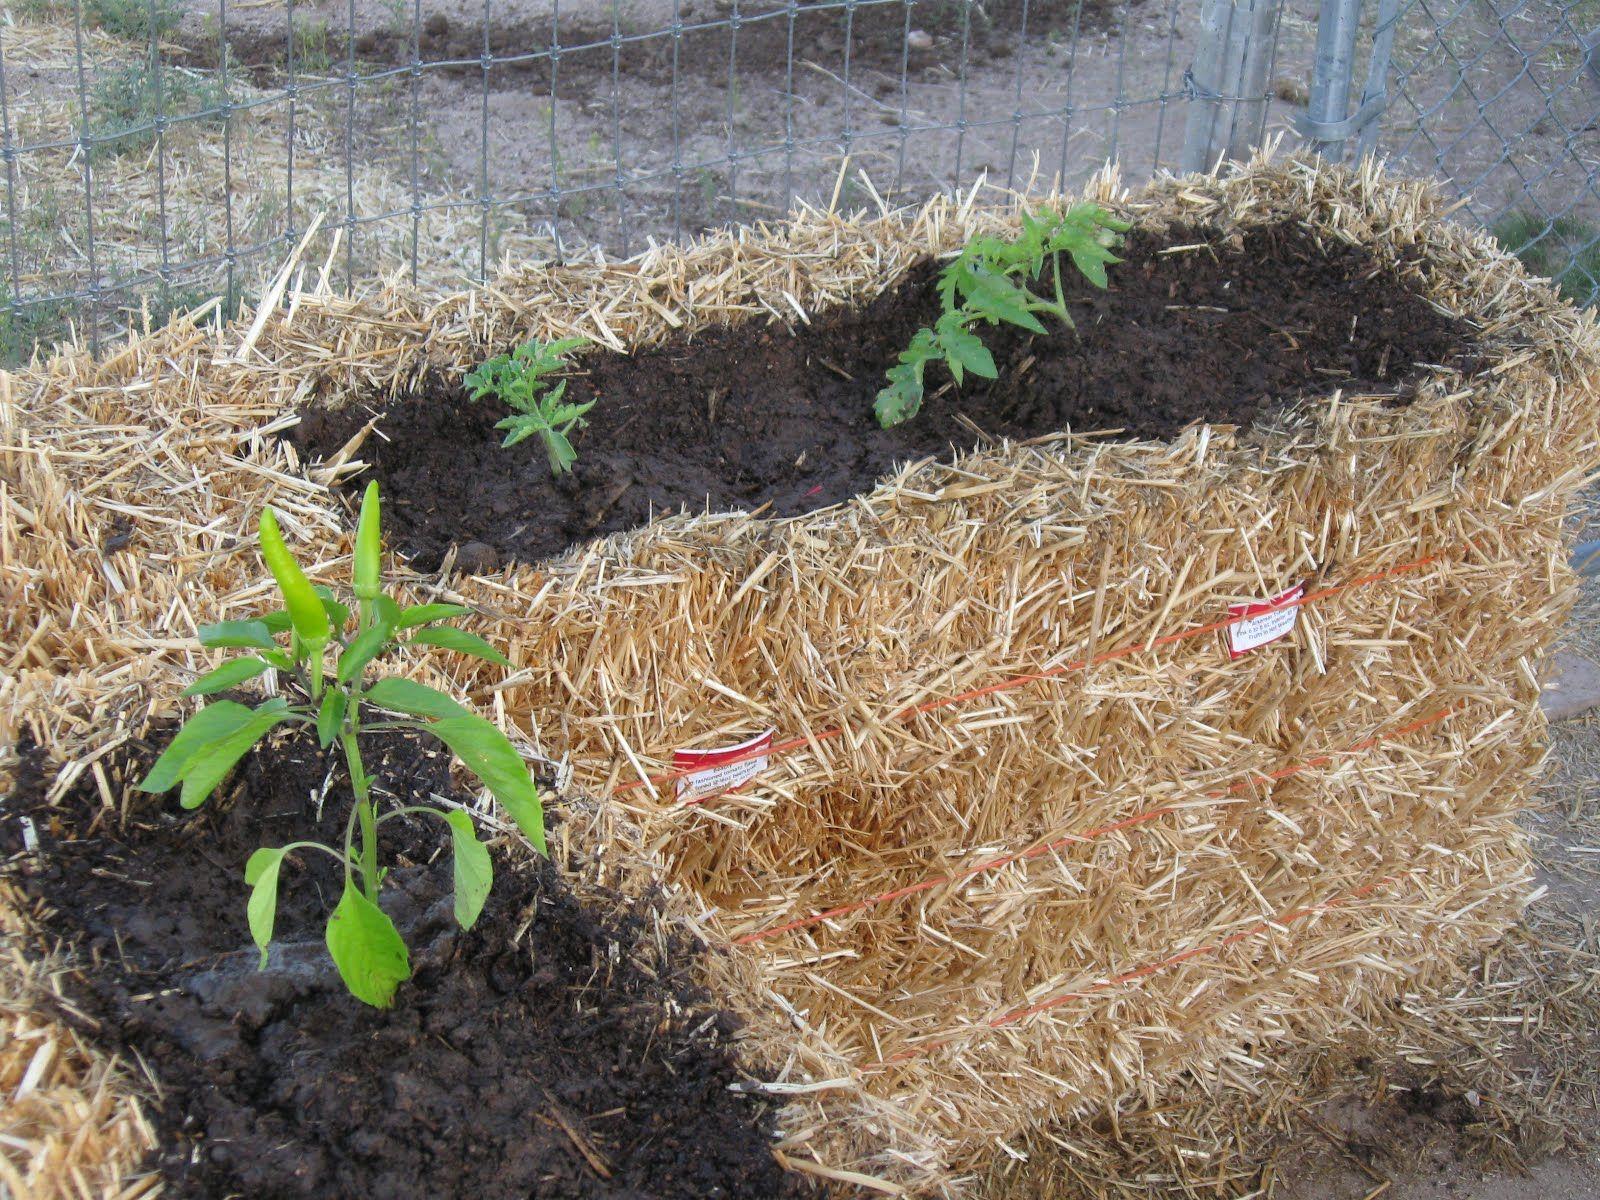 Straw Bale Gardening - Photo blog | Straw bales, Container gardening ...